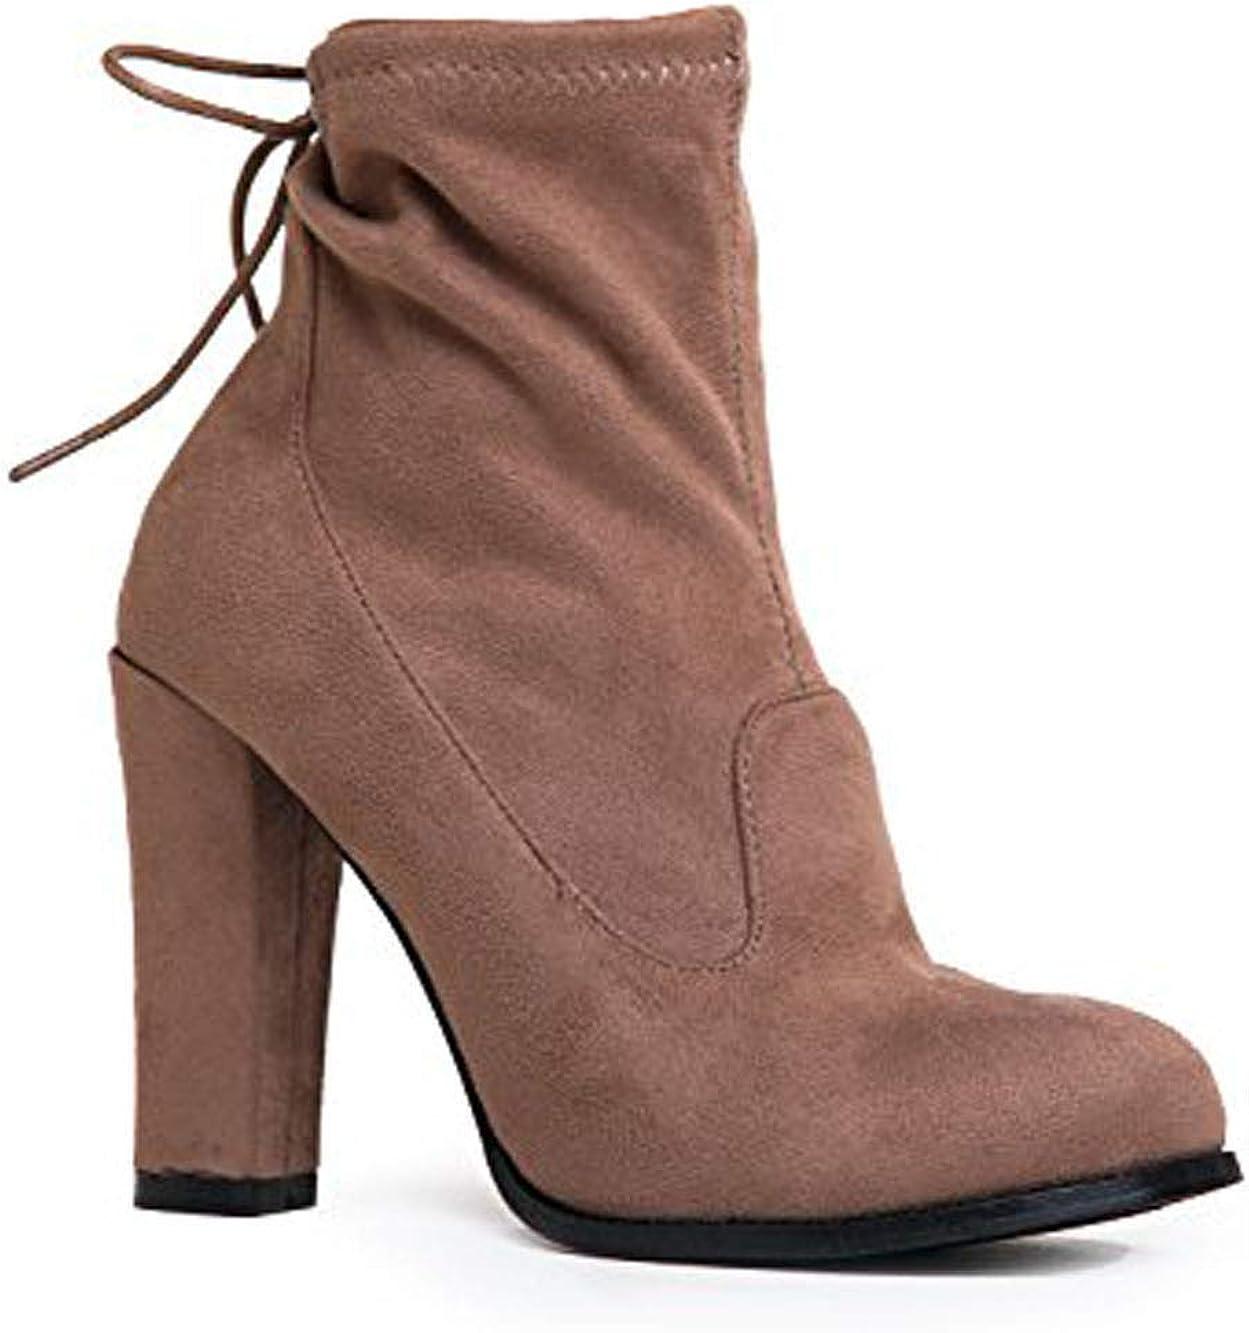 J. Adams High Heel Slip On Ankle Boot